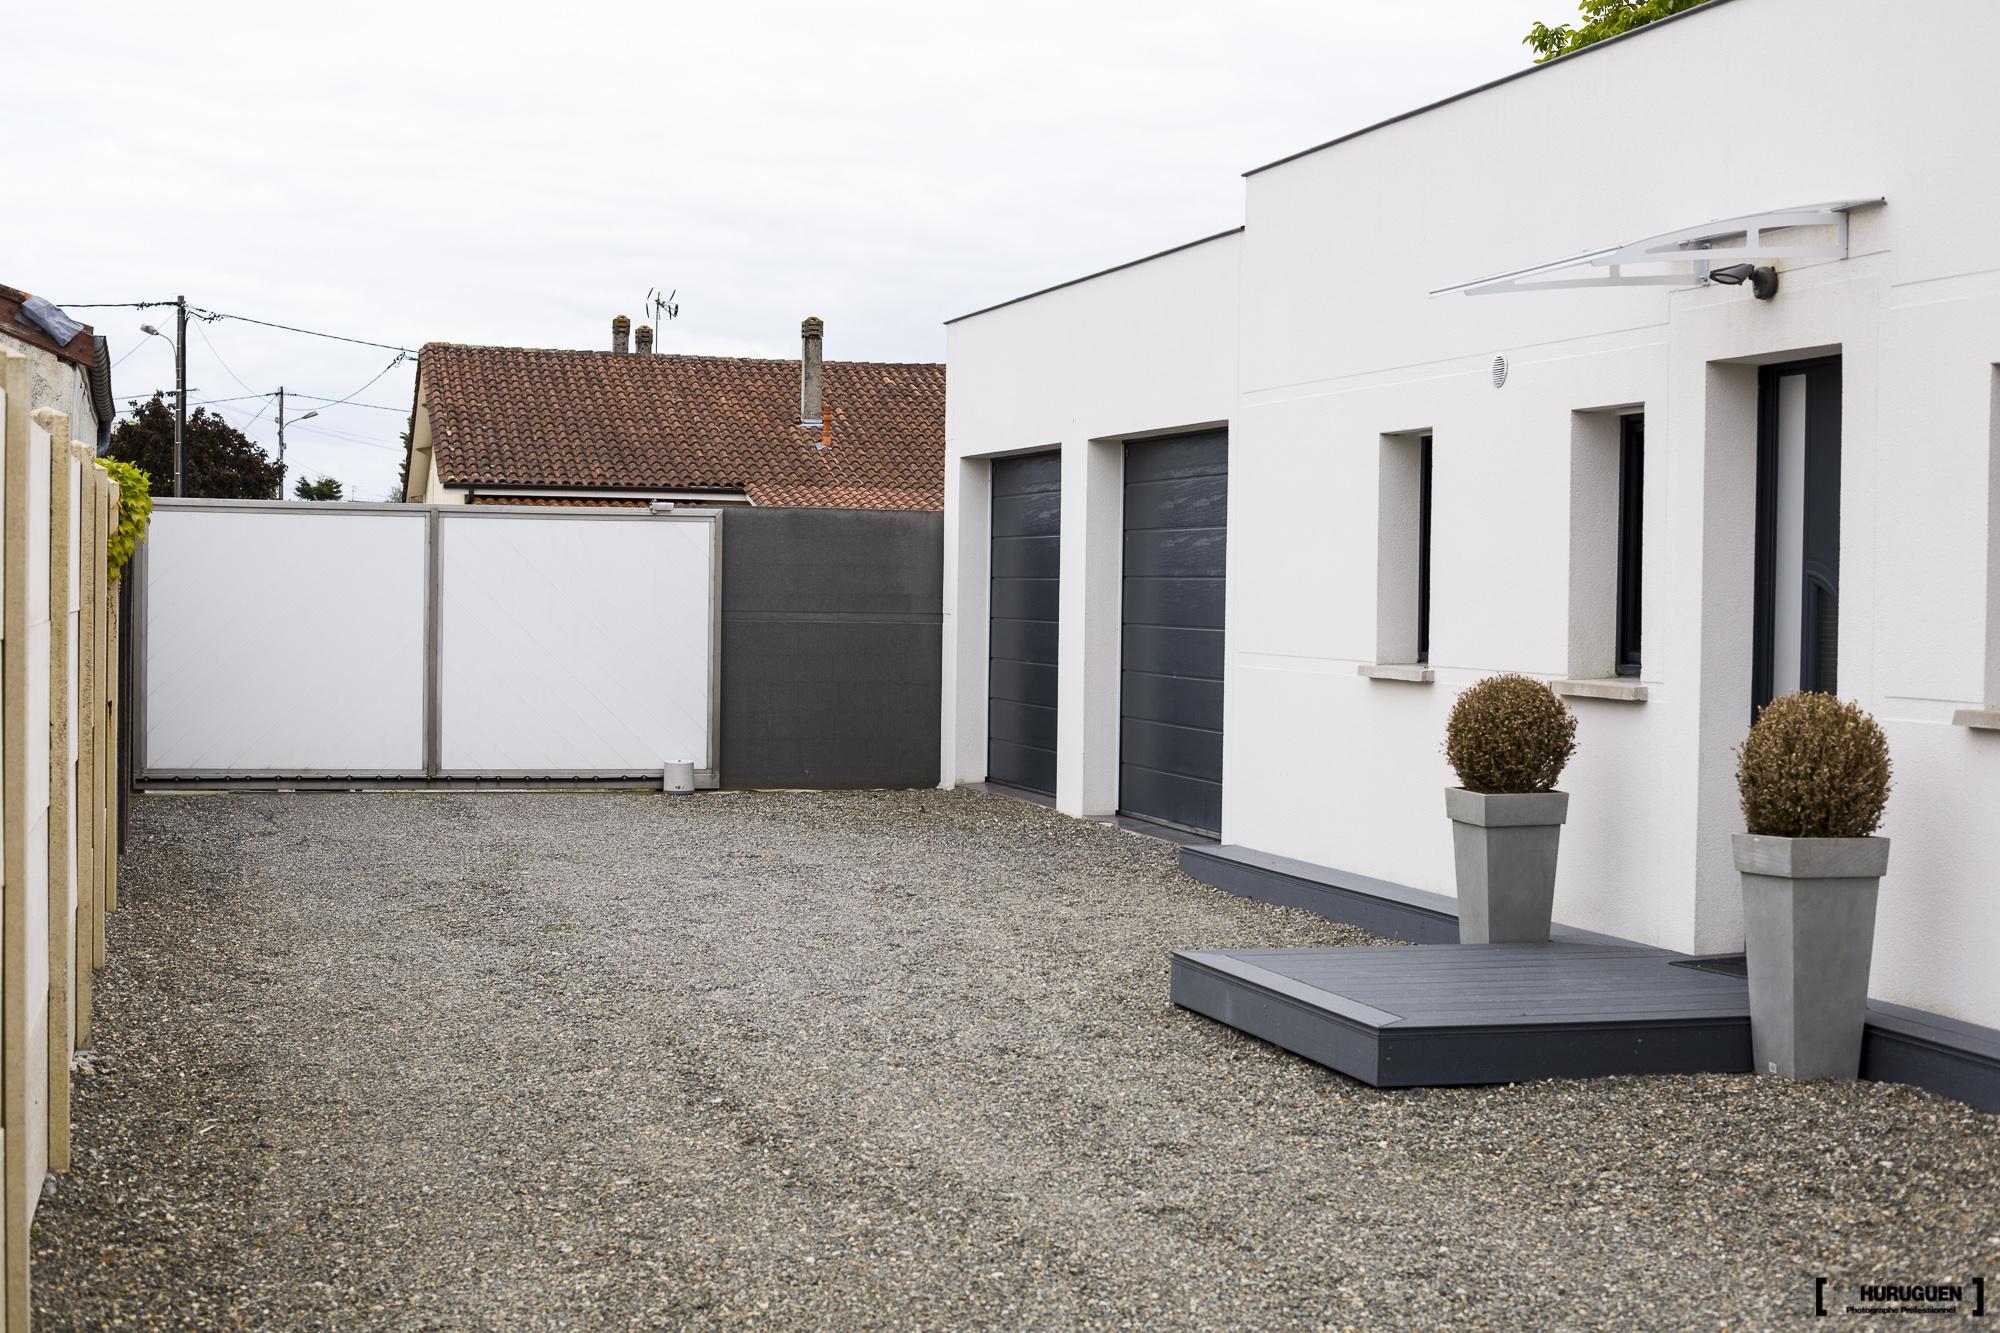 photographe immobilier photographe professionnel a bordeaux sebastien huruguen. Black Bedroom Furniture Sets. Home Design Ideas